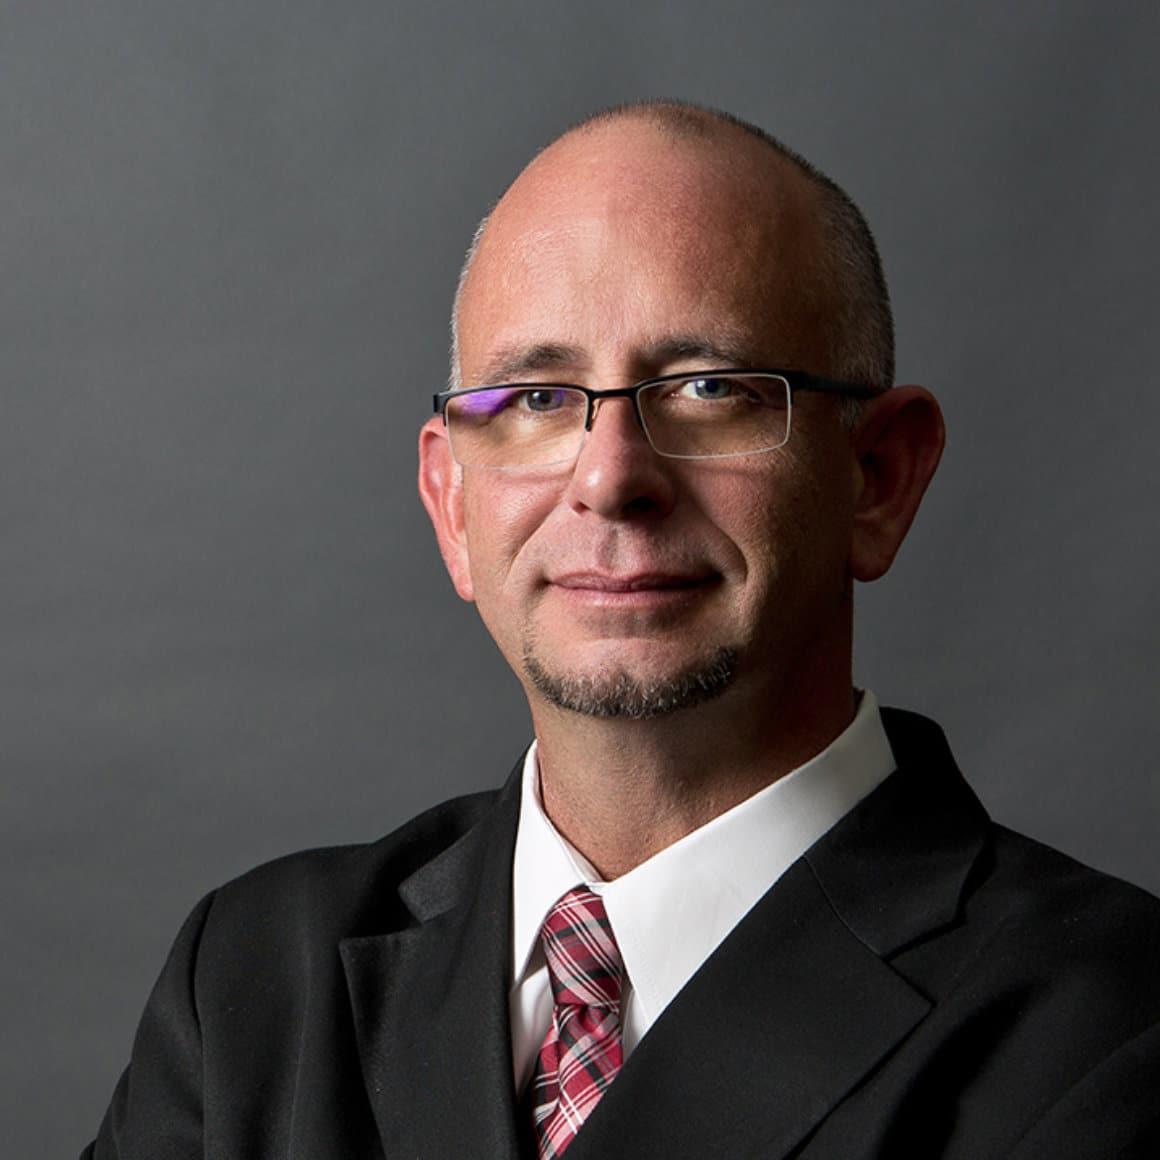 Ross Dietrich